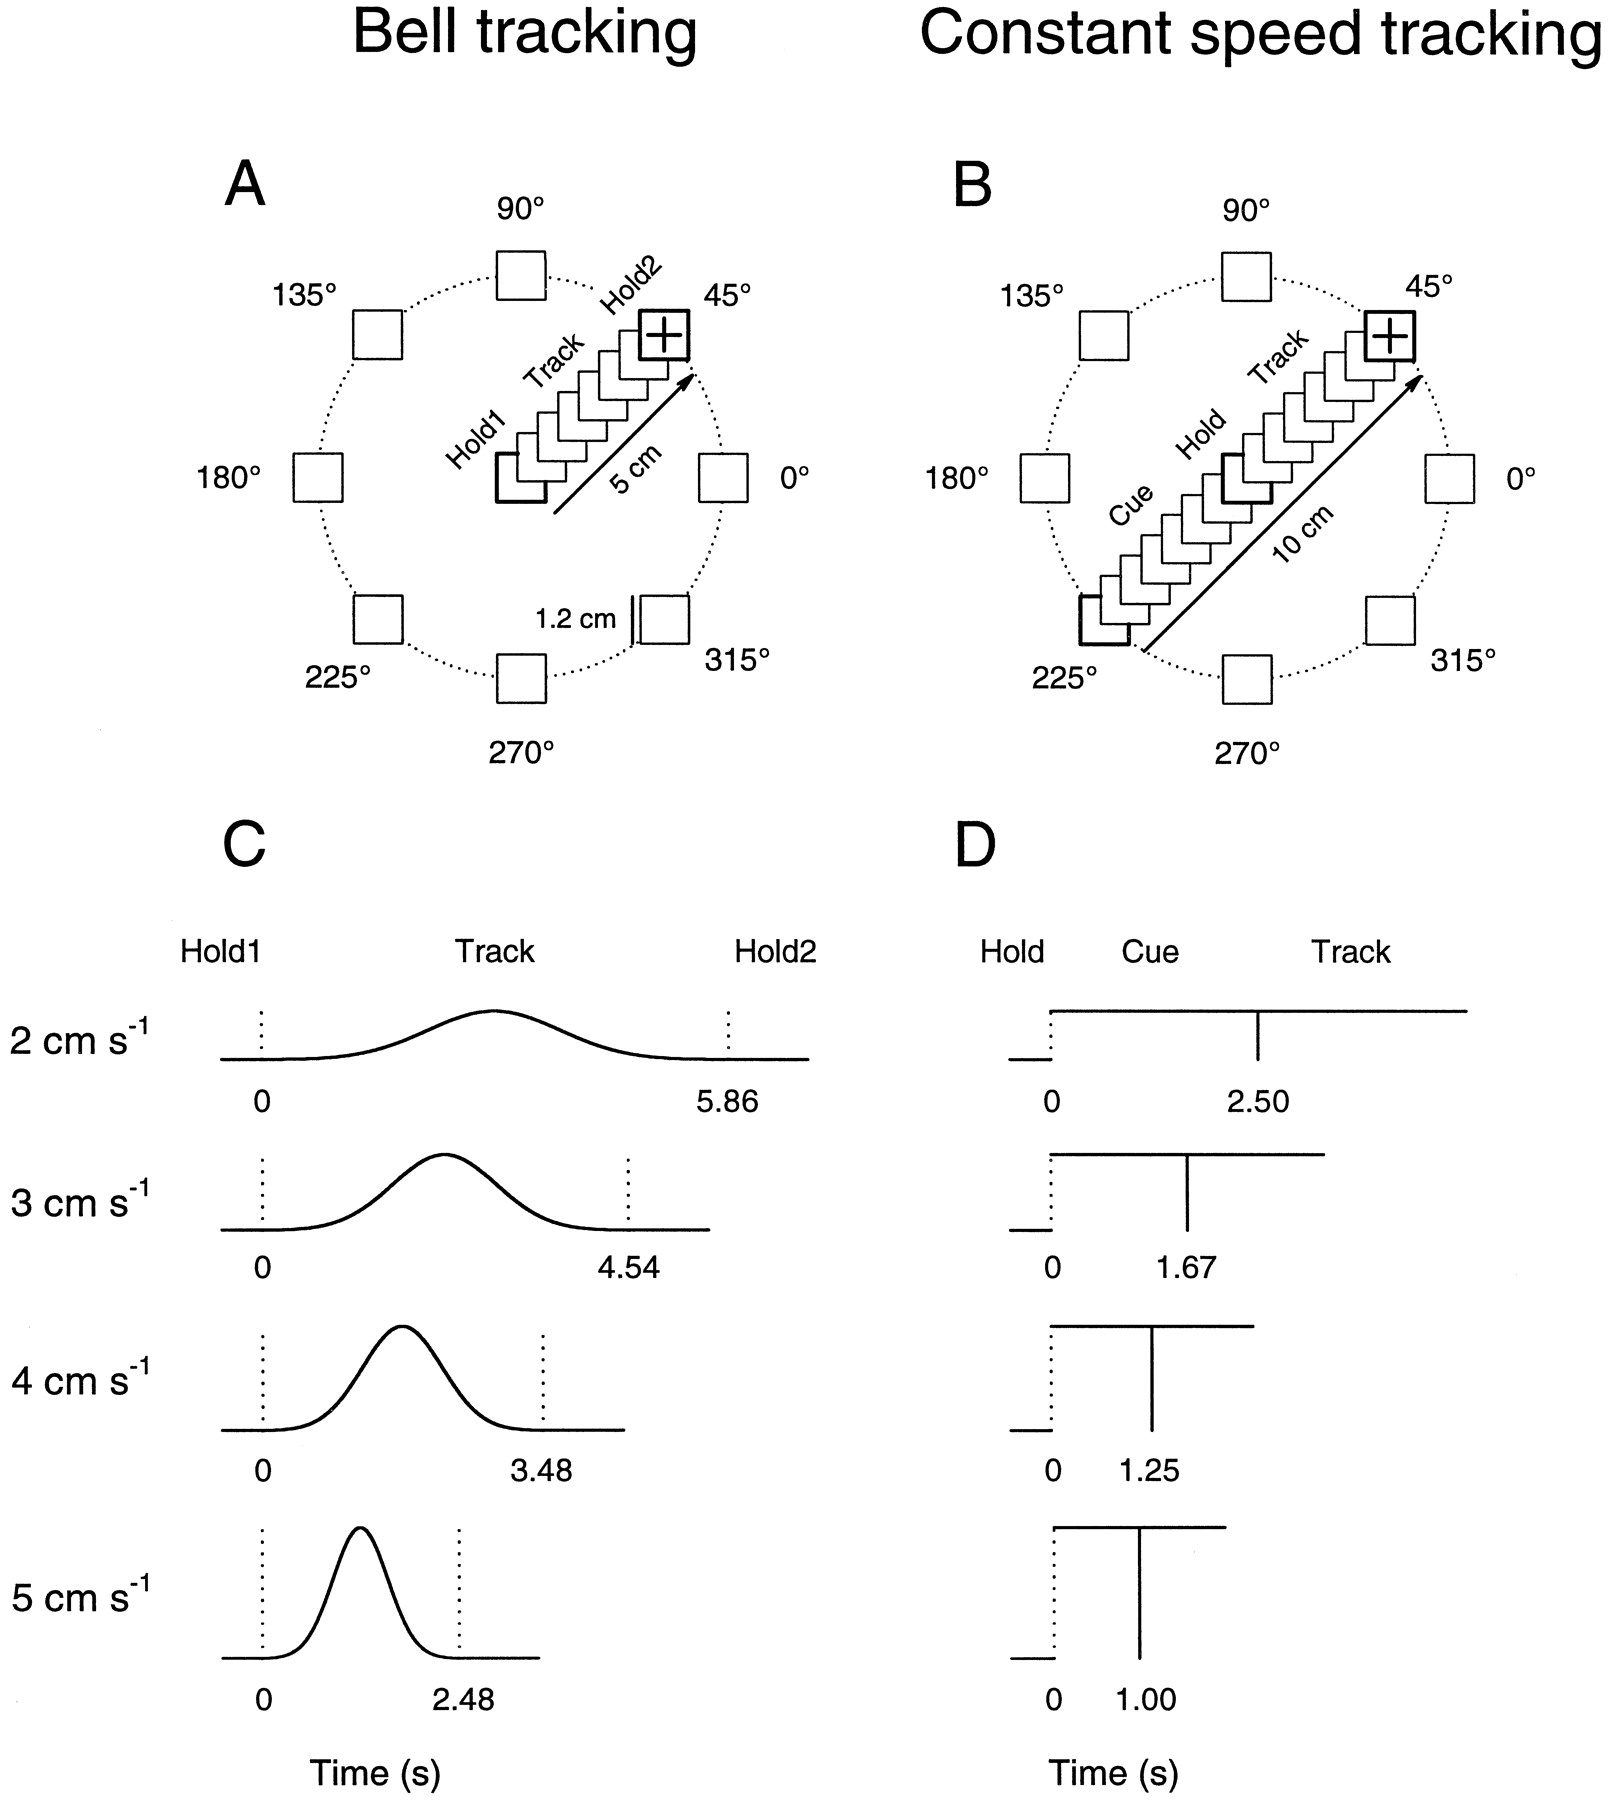 Cerebellar Purkinje Cell Simple Spike Discharge Encodes Movement Block Diagram Of The Egt Emg Cursor Control System Eye Gaze Download Figure